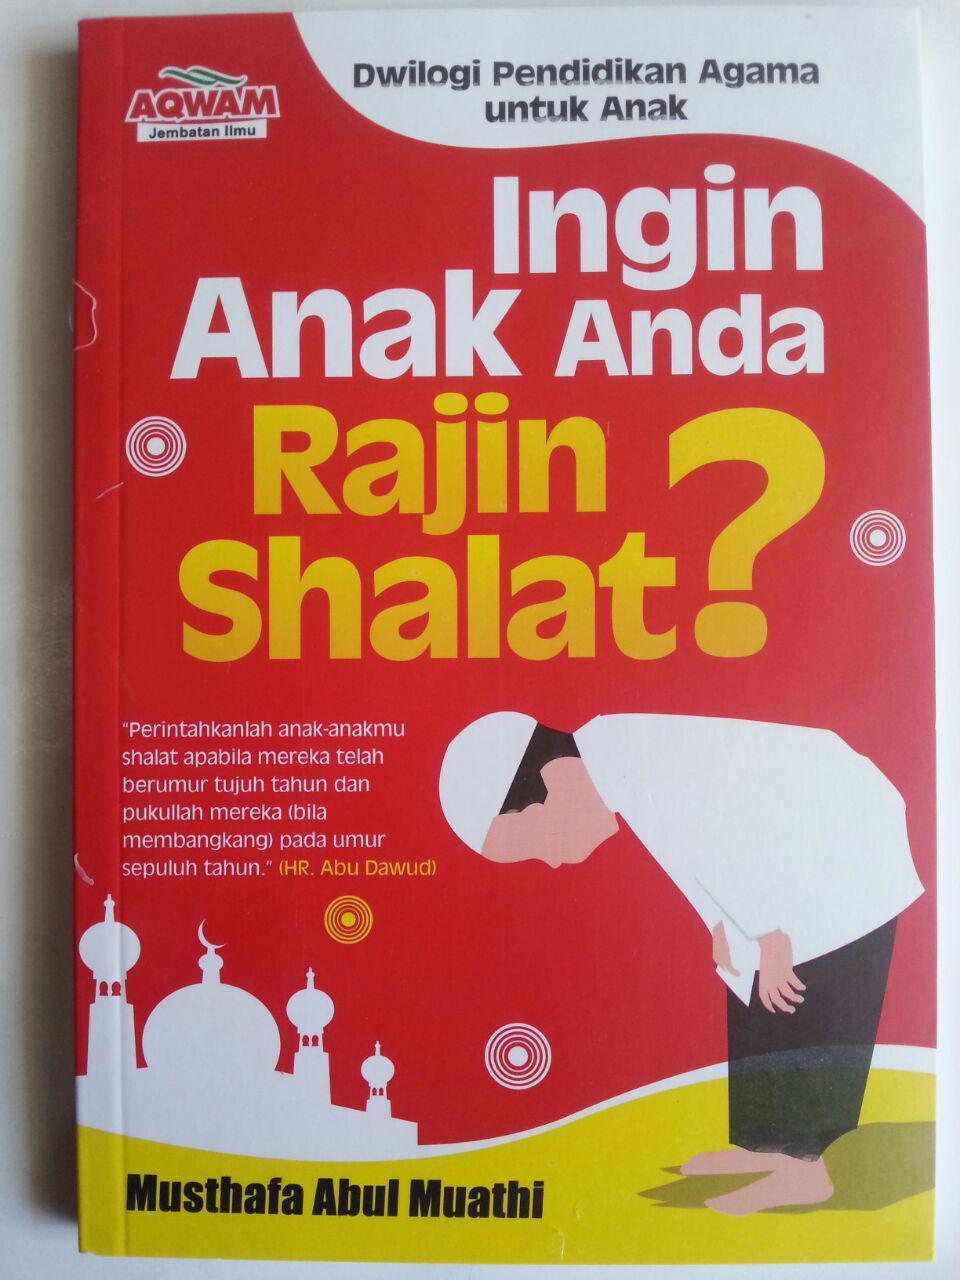 Buku Ingin Anak Anda Rajin Shalat Pendidikan Agama Untuk Anak cover 2